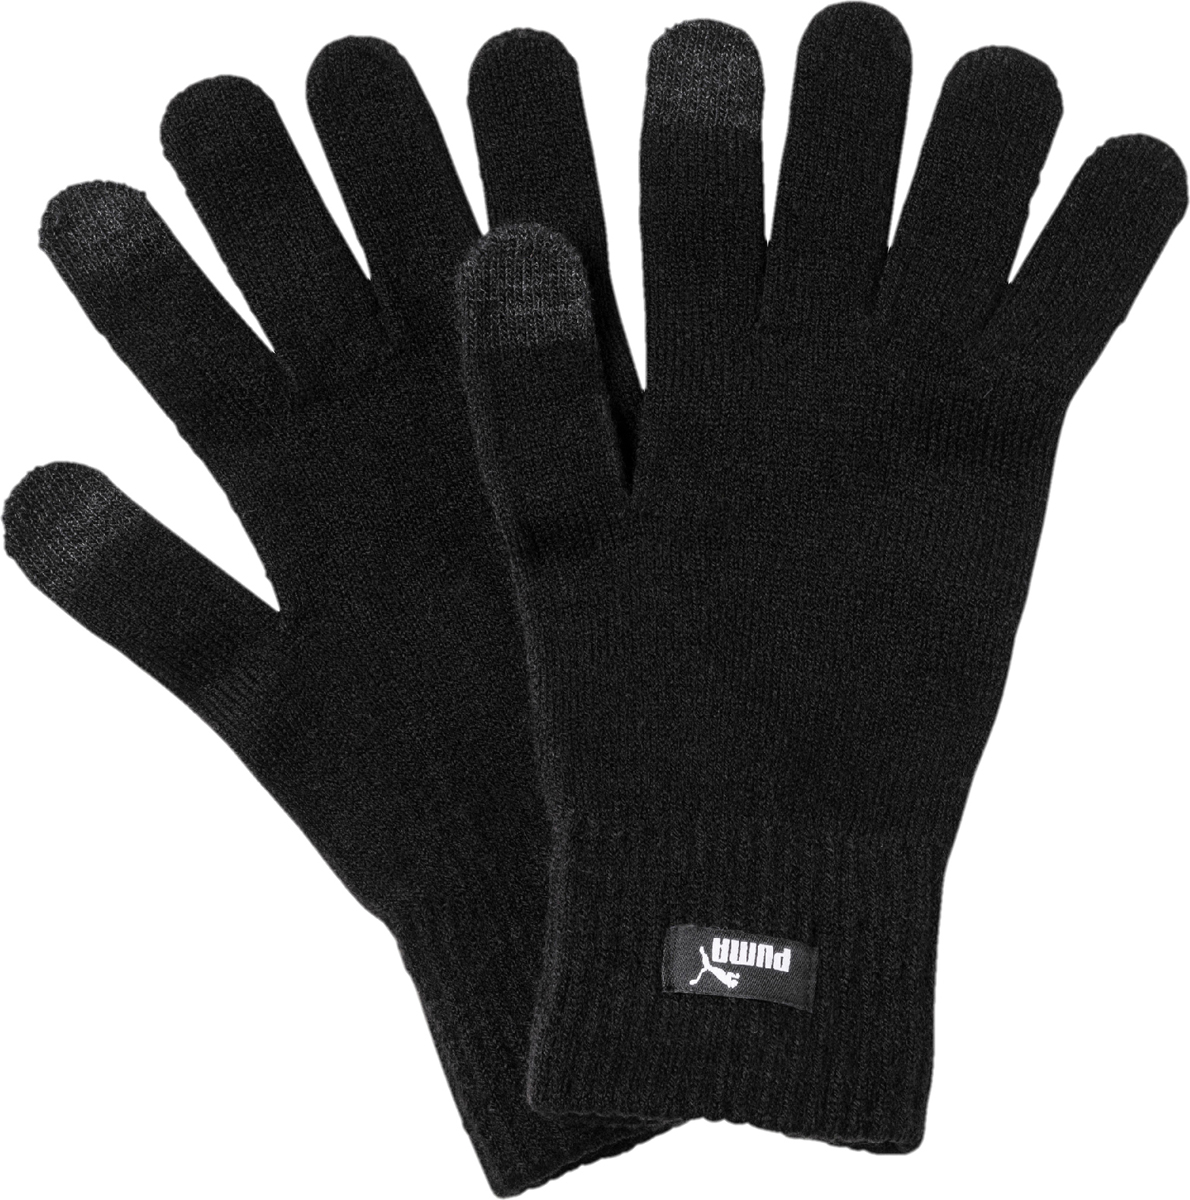 Перчатки PUMA Knit Gloves перчатки спортивные puma перчатки puma tr gloves up